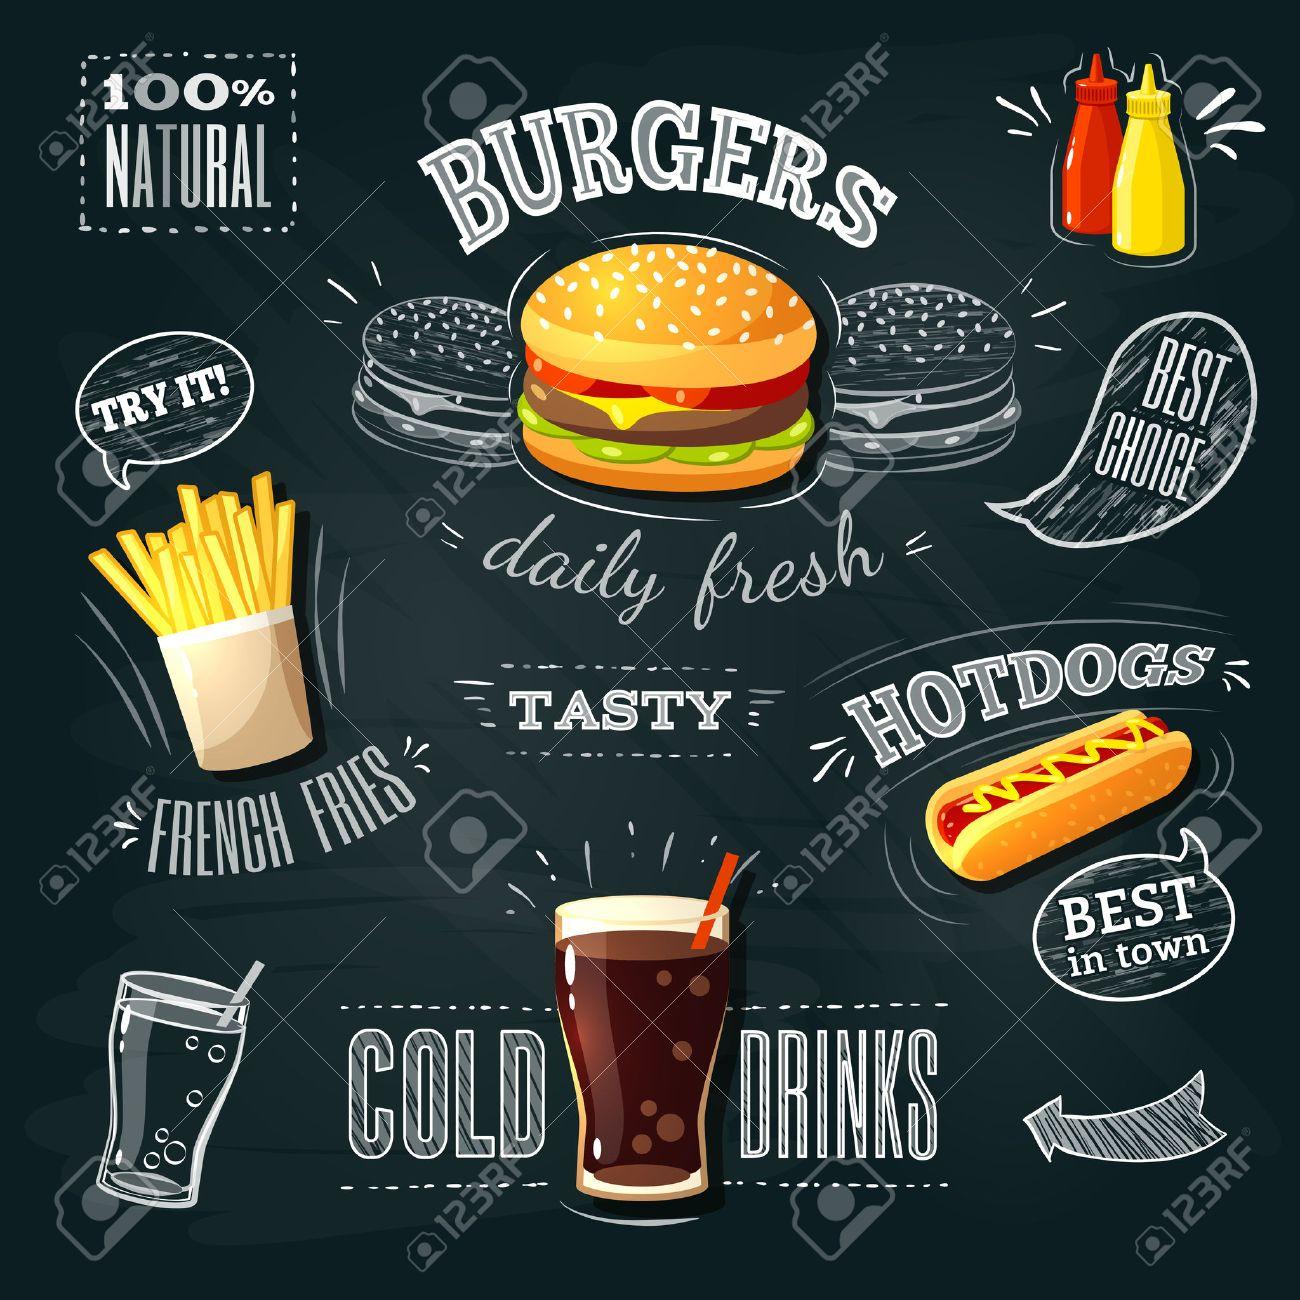 Chalkboard fastfood ADs - hamburger, french fries and hotdog. Vector illustration, - 53400069